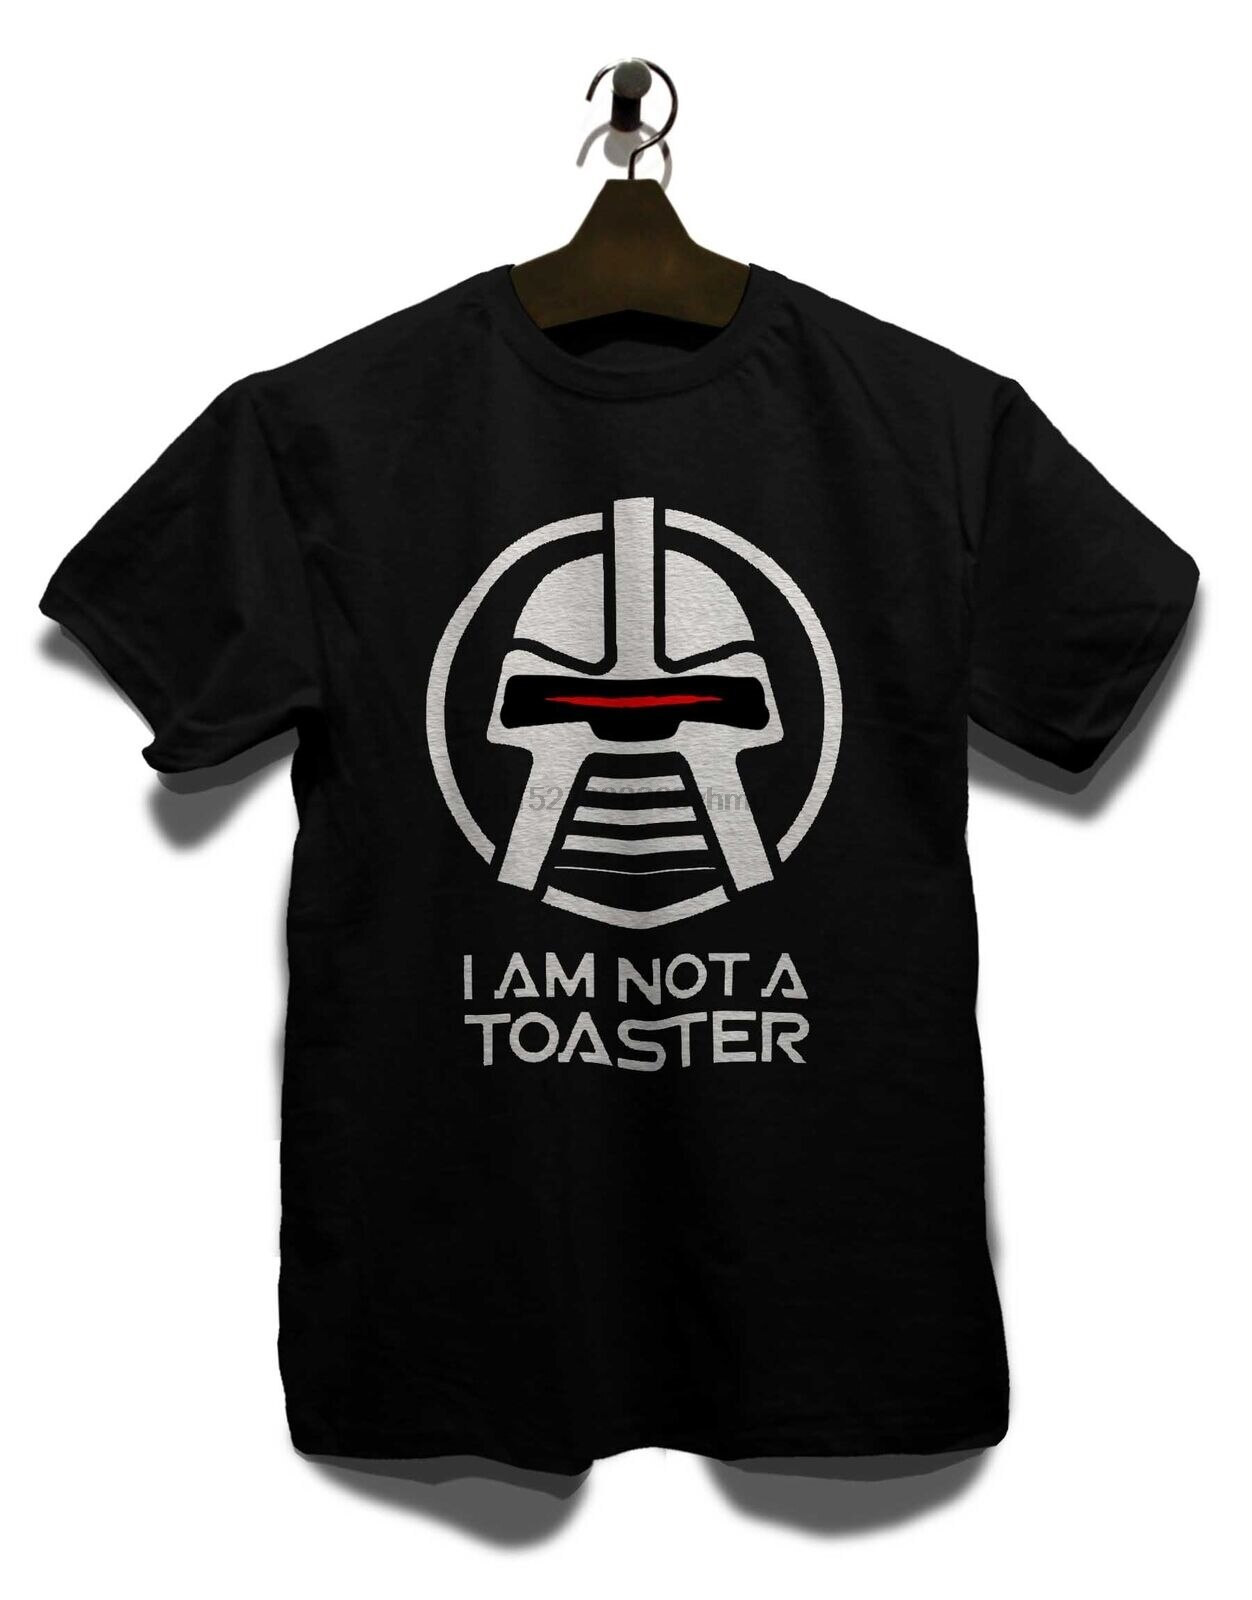 Cylon no soy una tostadora camiseta galáctica Zylon Battelestar Kampfstern